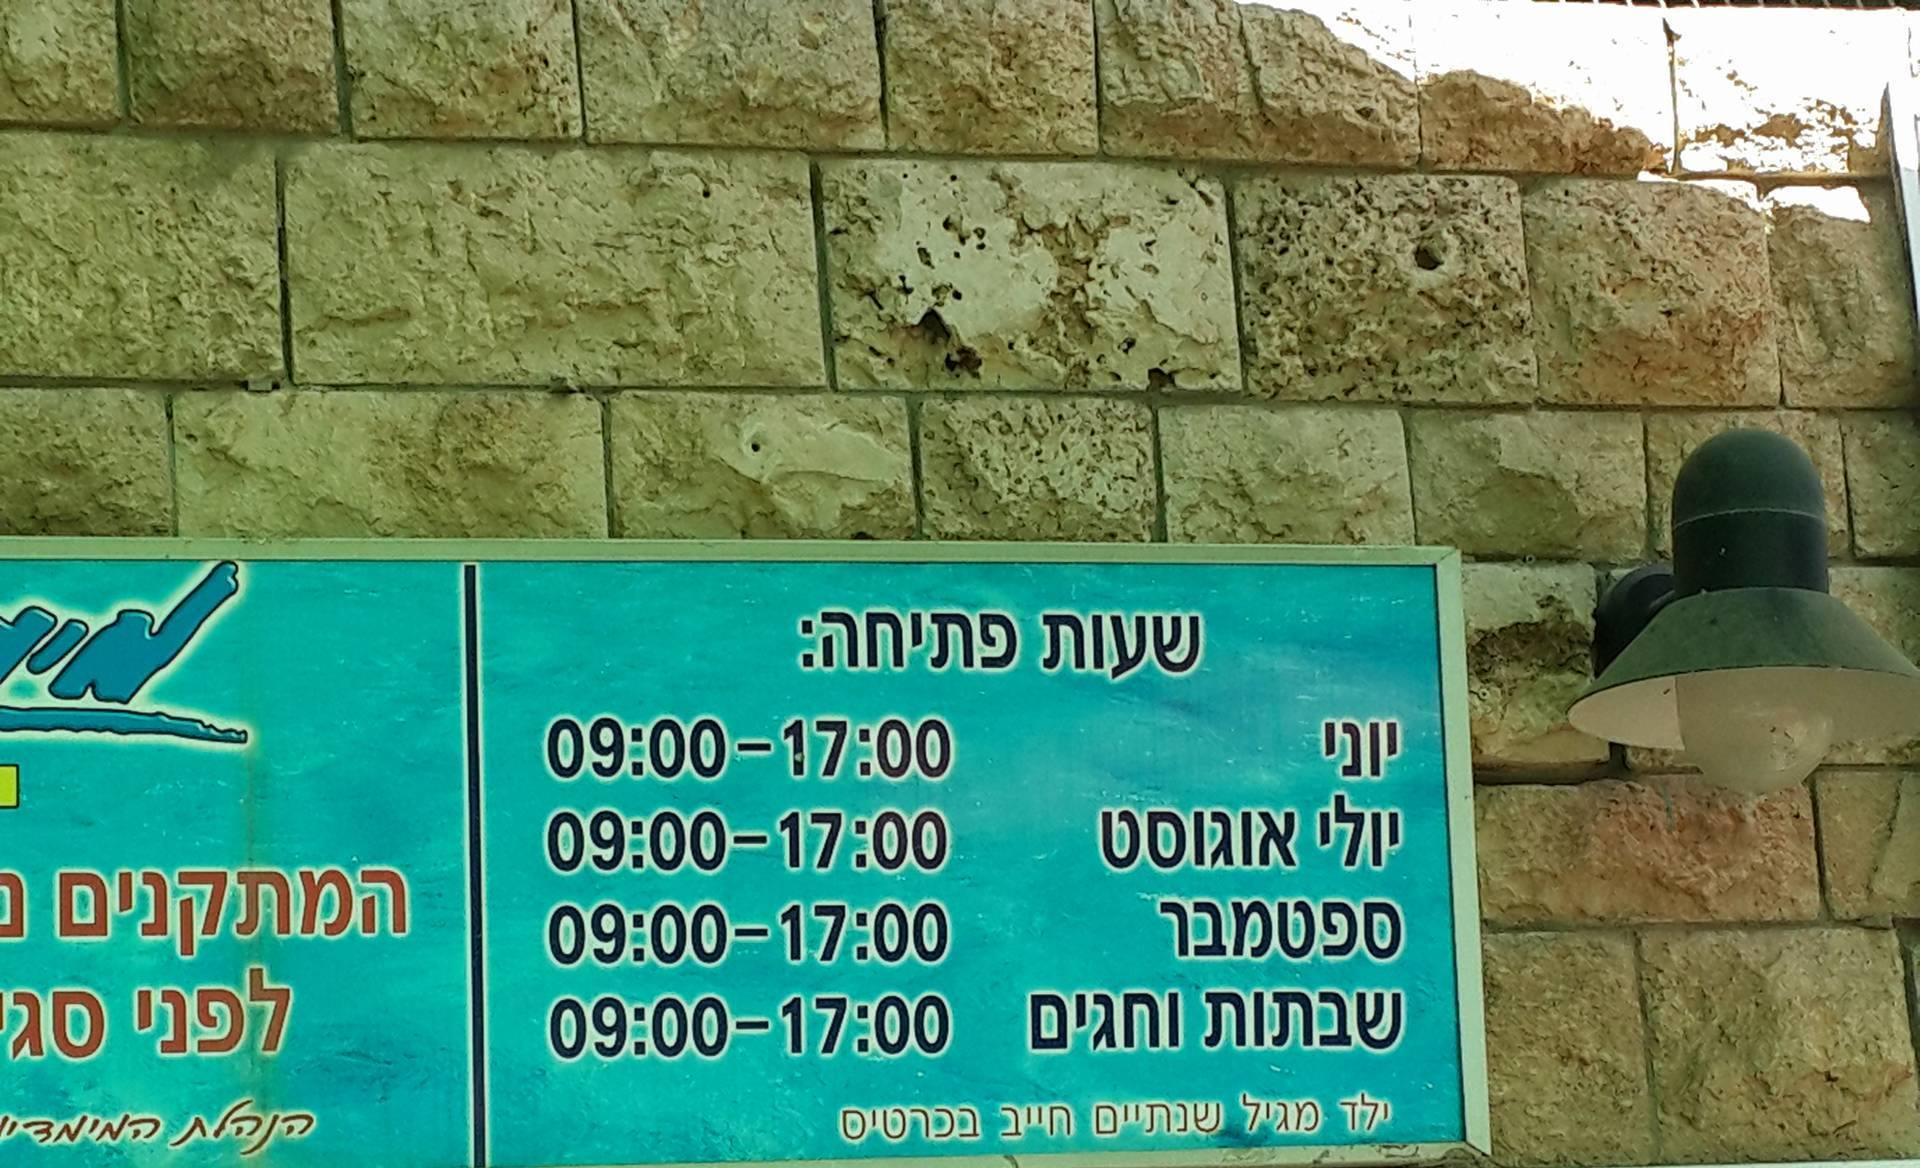 Elad Cohen - שעות פתיחה ממדיון